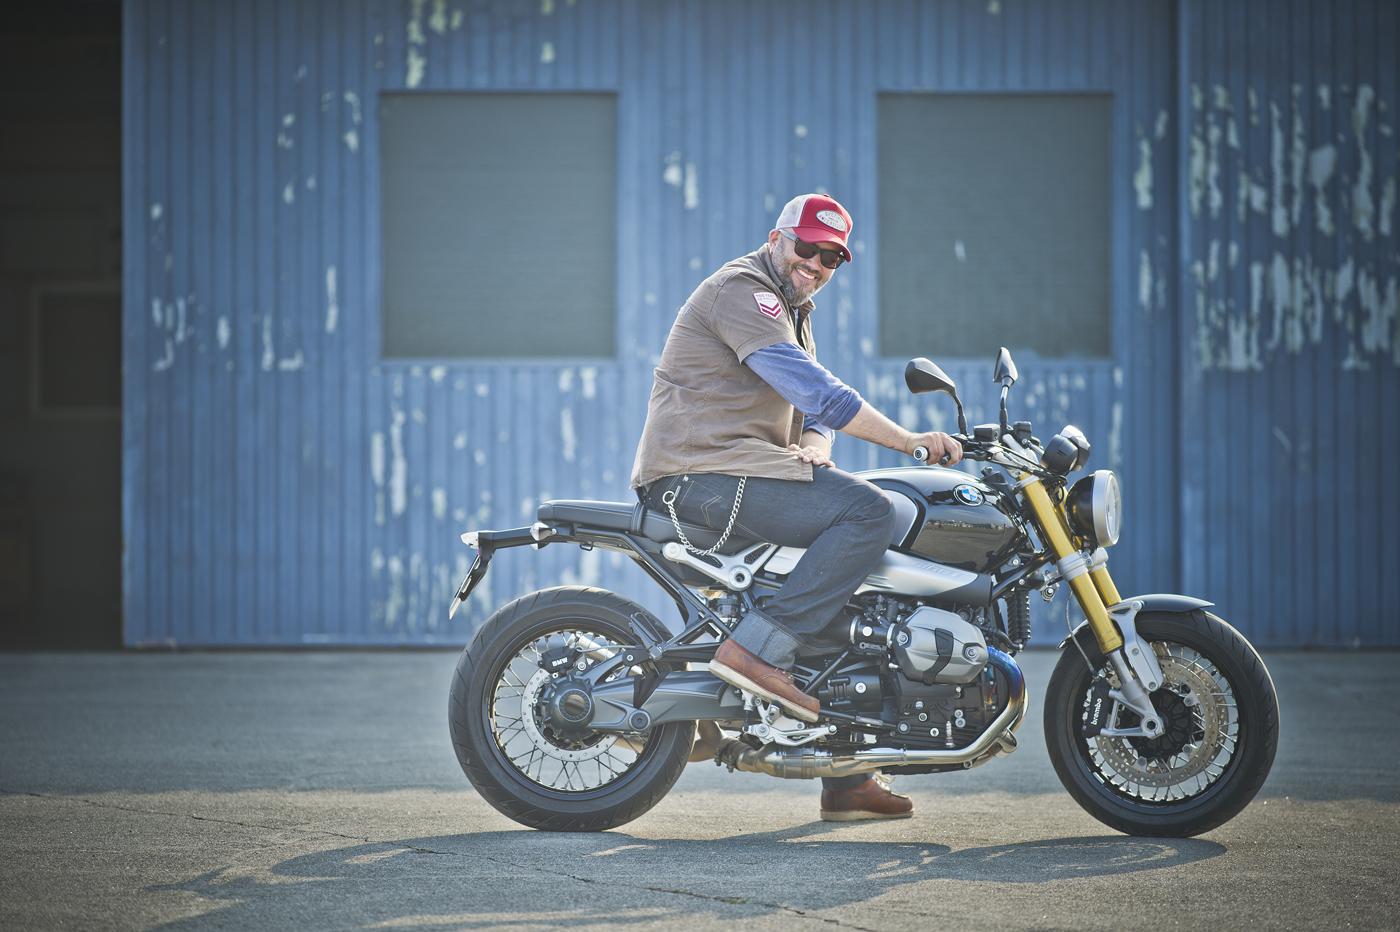 A BMW Motorrad design főnöke az eredeti BMW-n